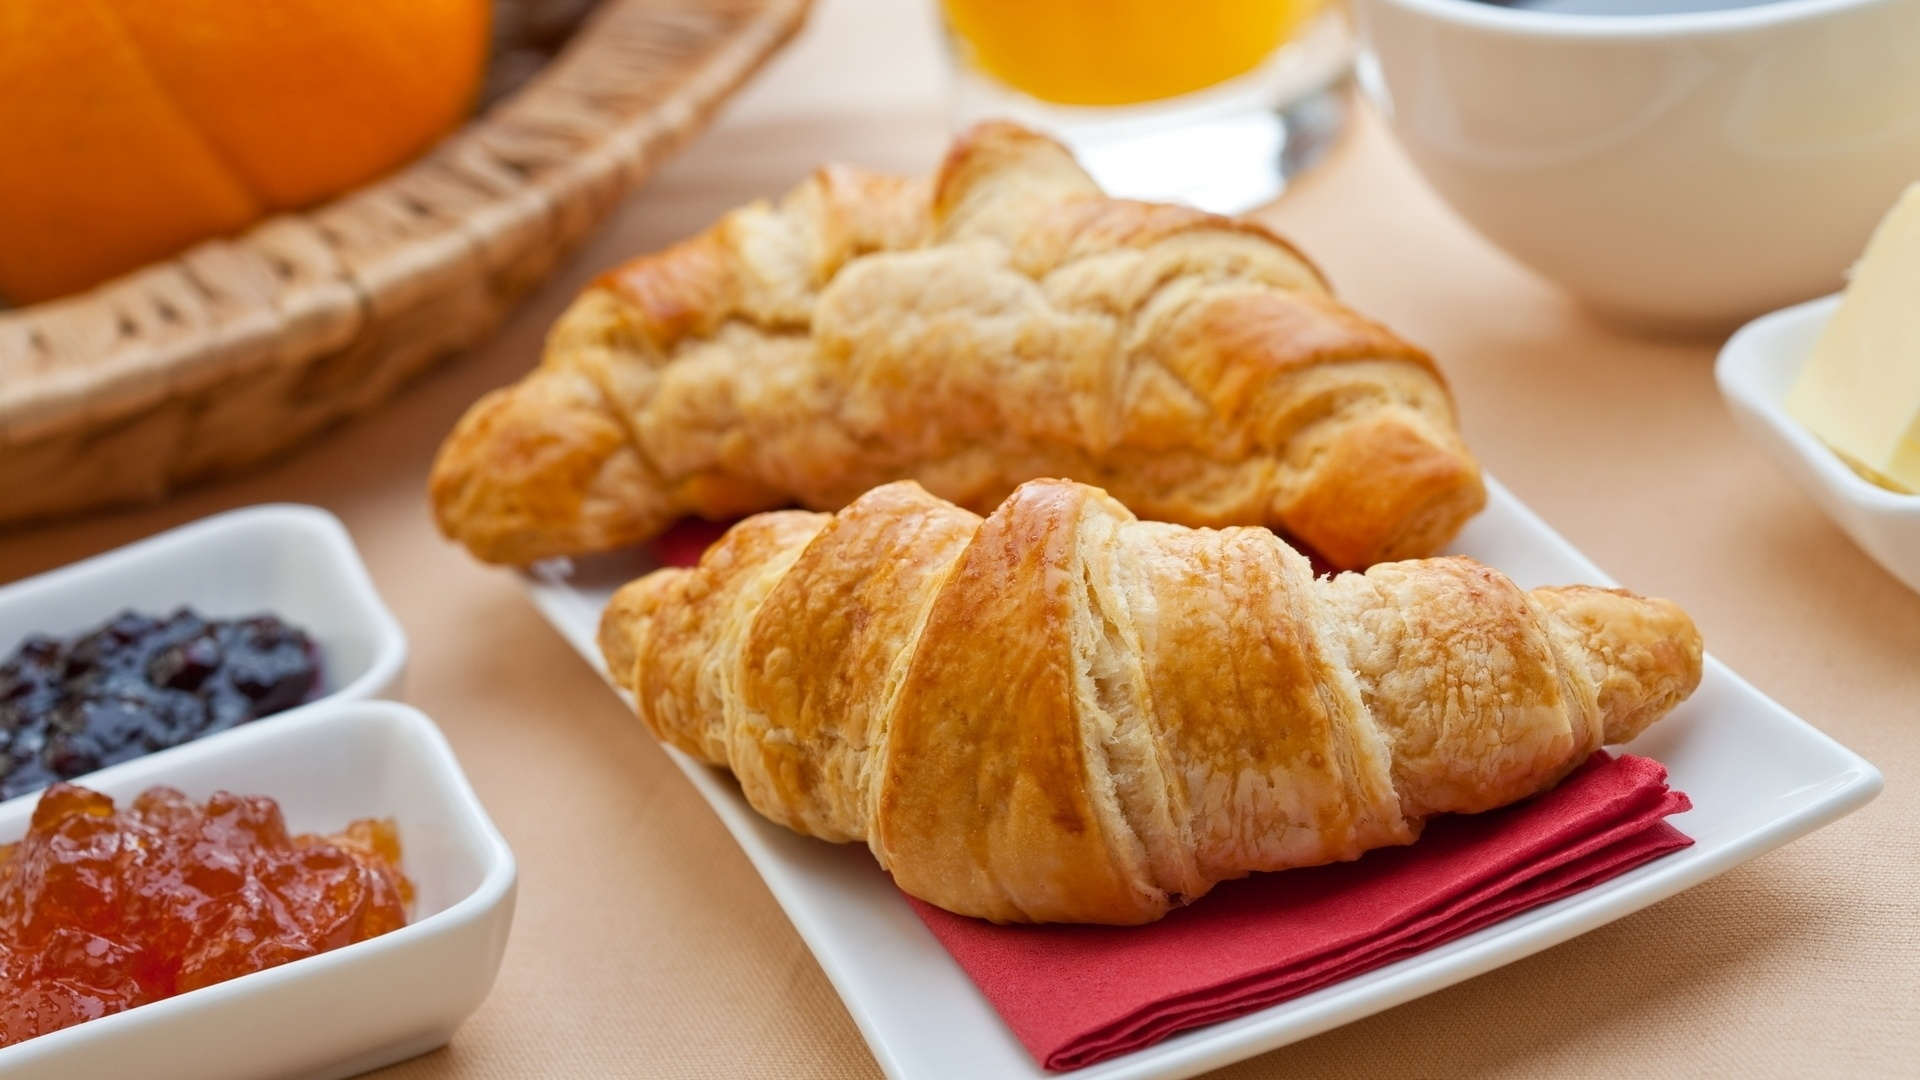 Croissants wallpaper for pc